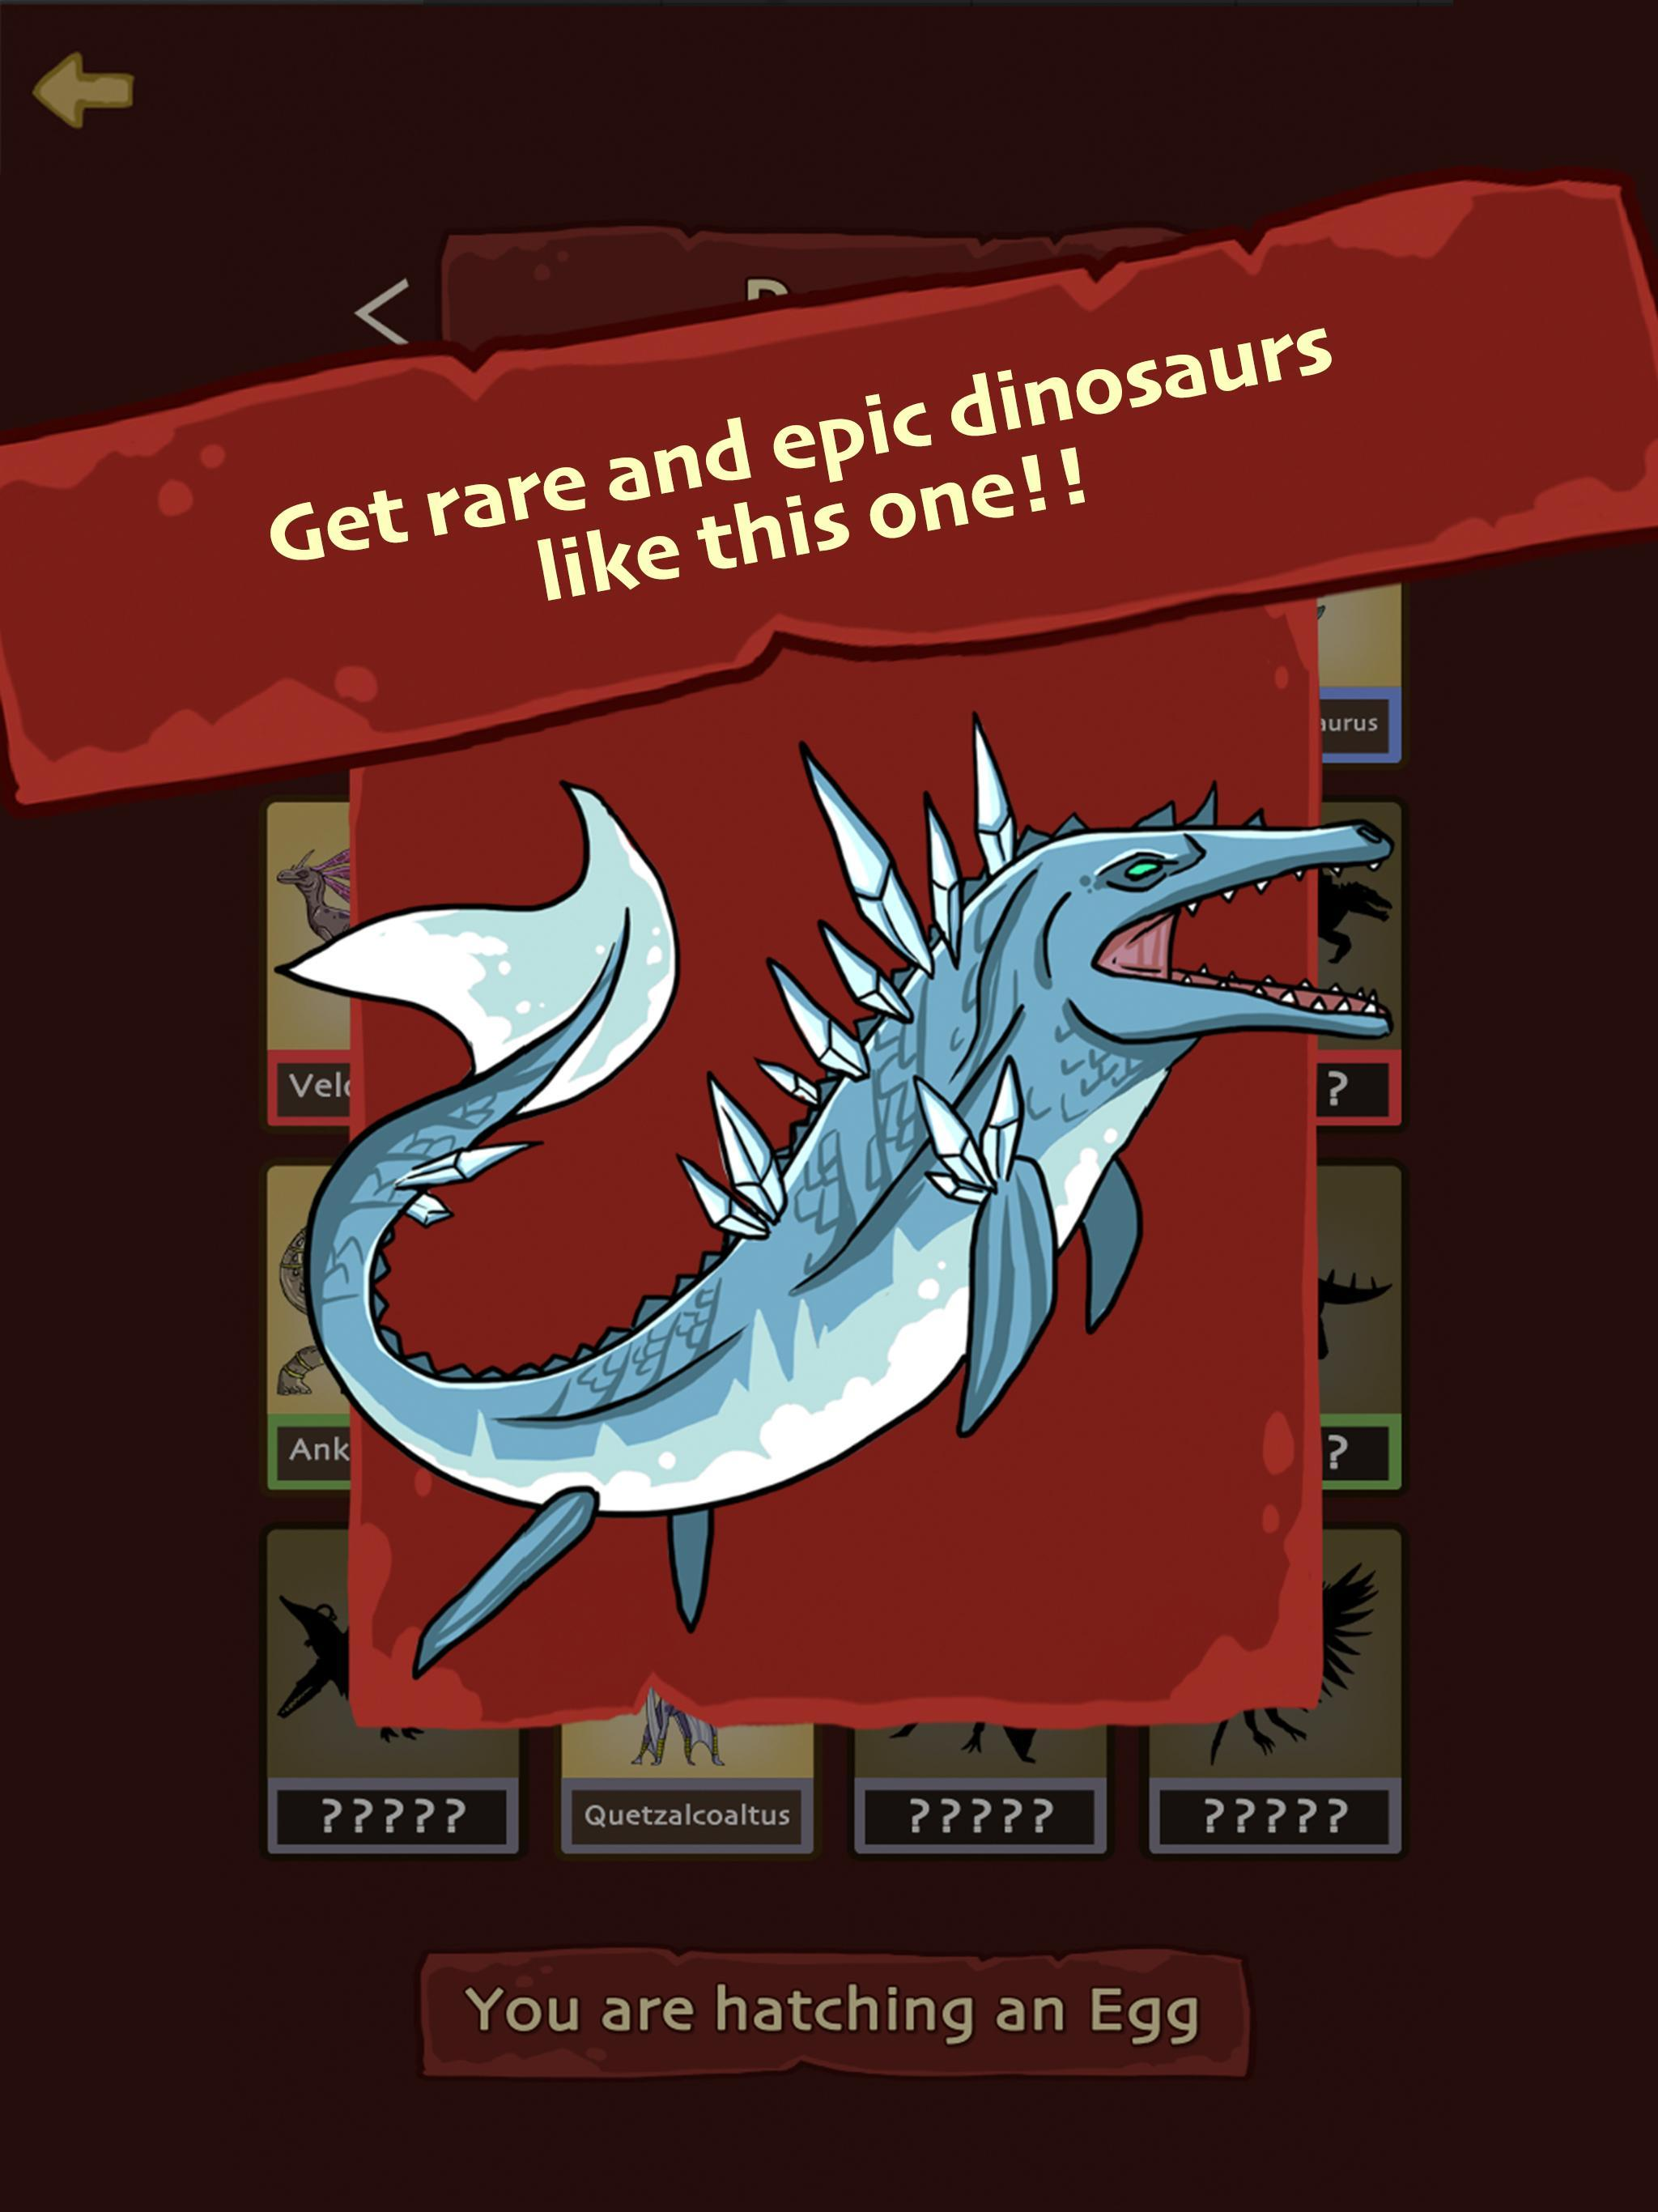 Hatch Dinosaur Eggs - Jurassic World Clicker Games 1.0.7 Screenshot 8